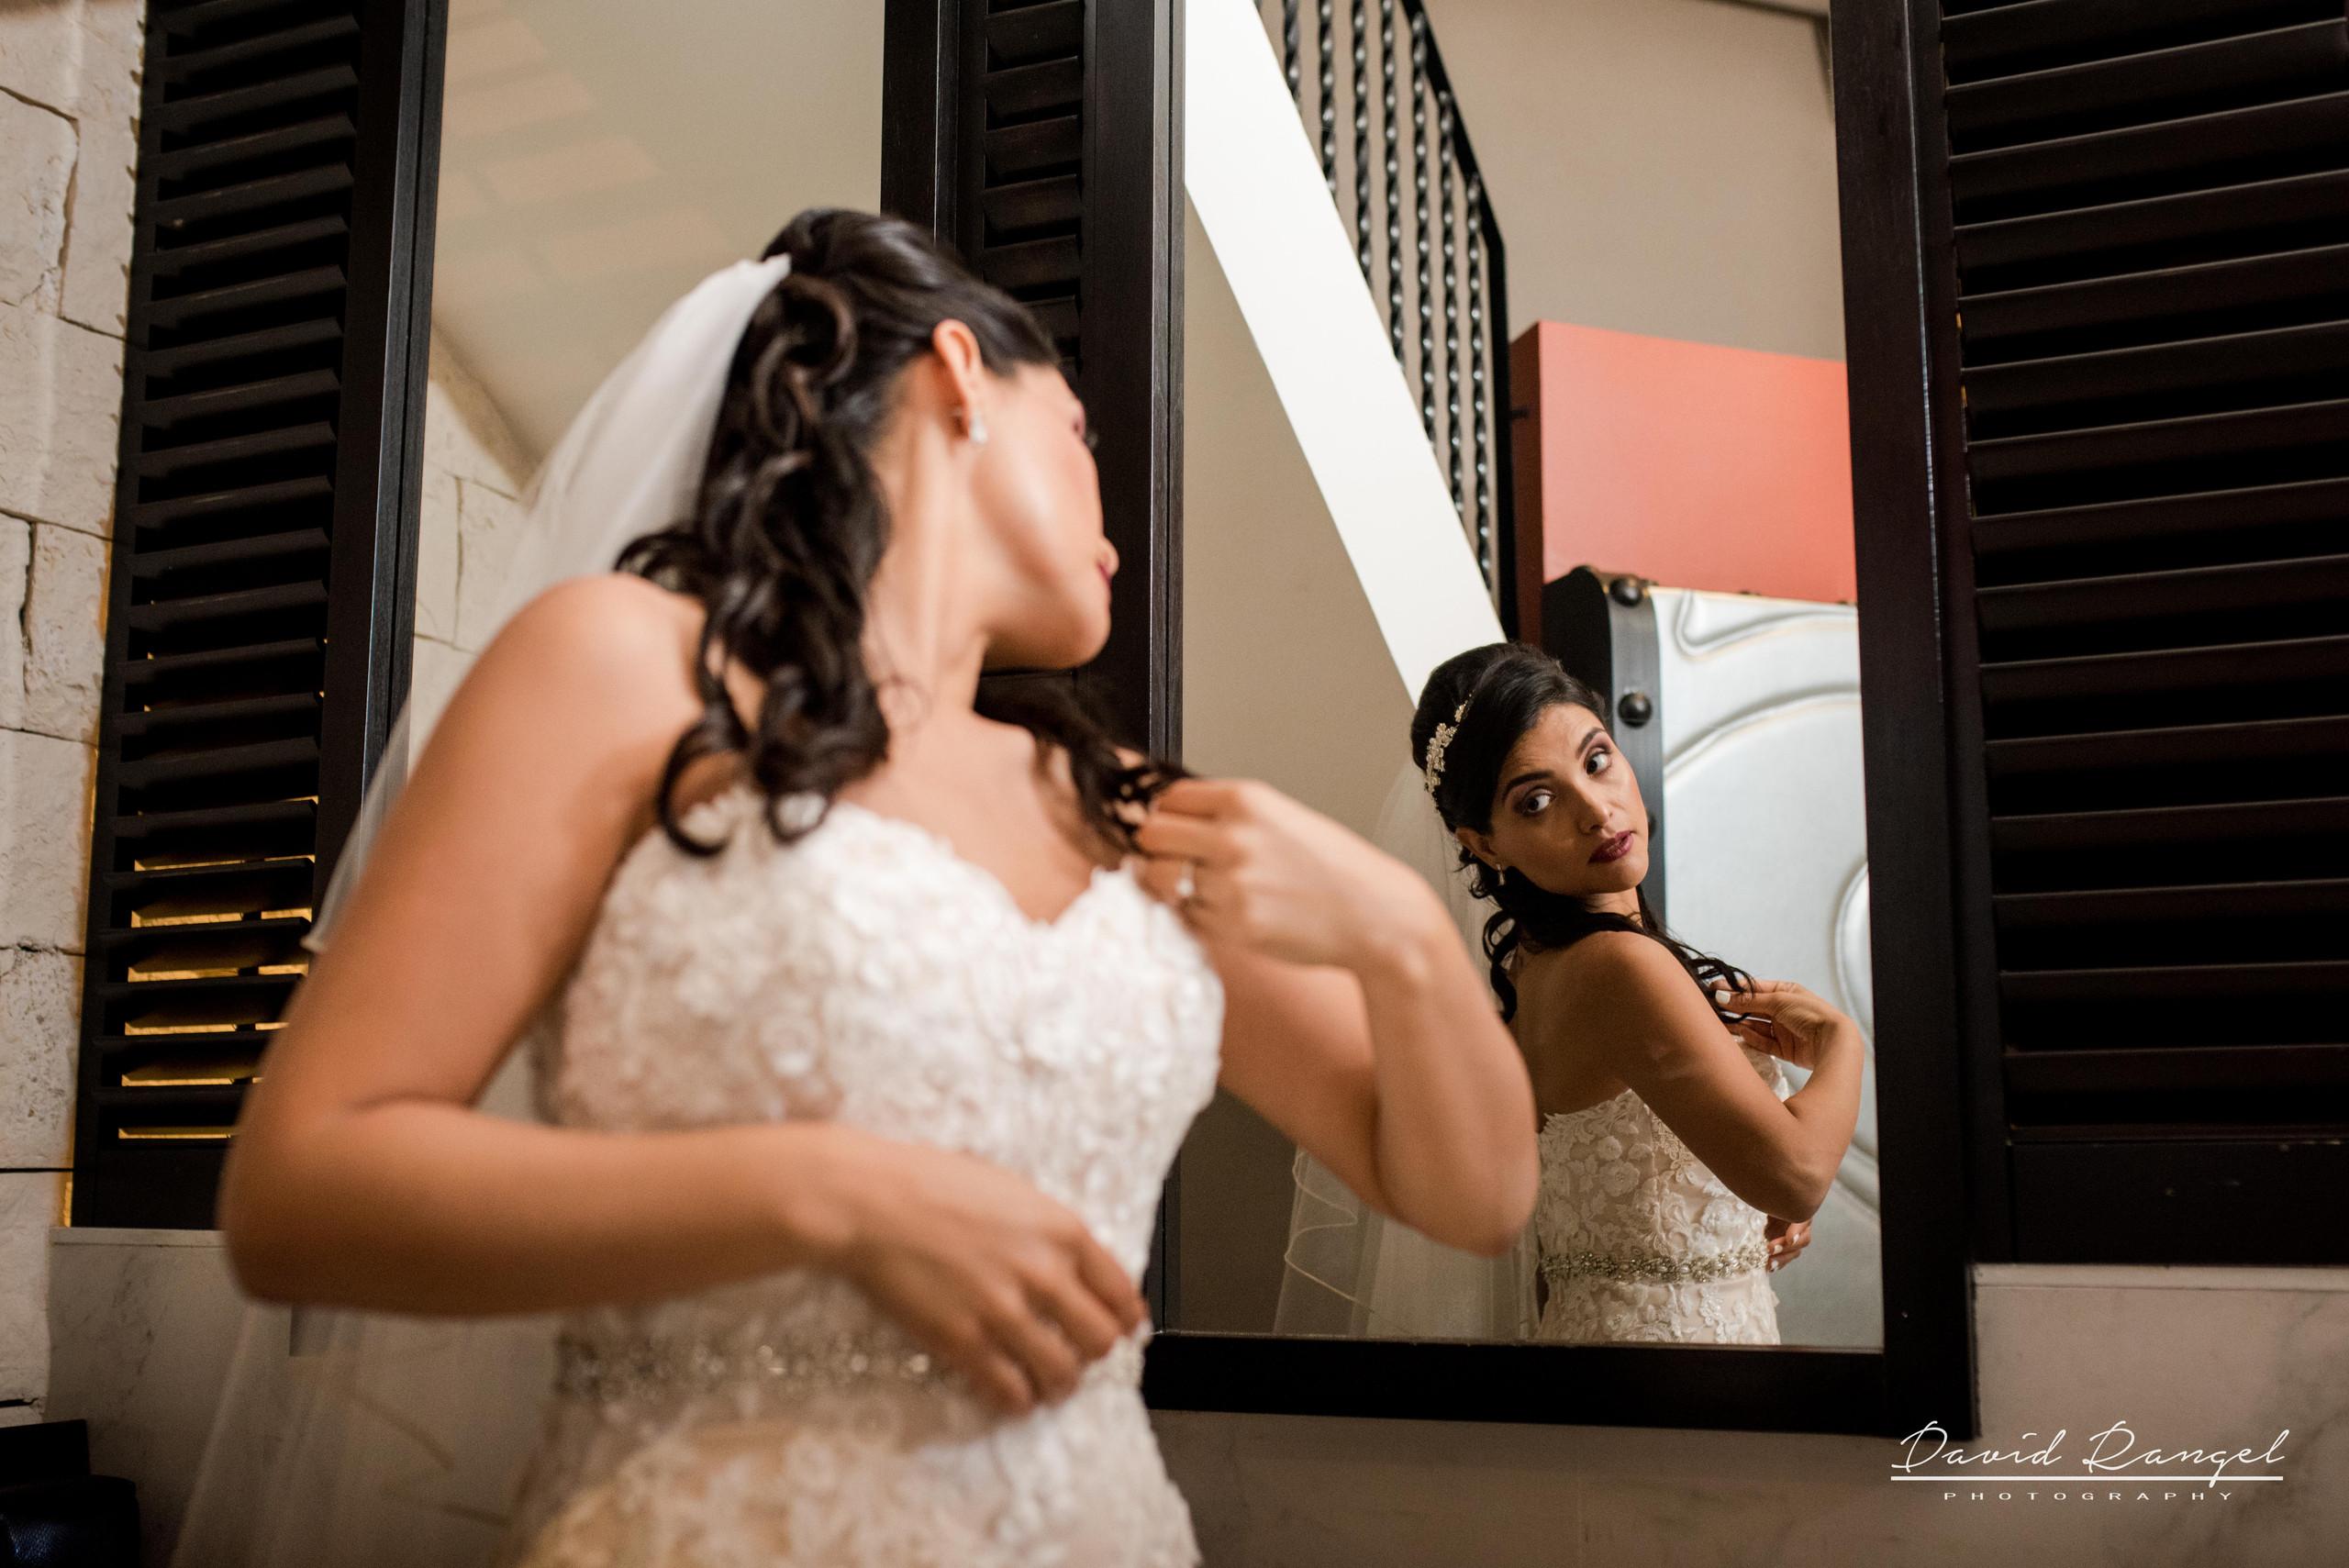 dress+bride+reflection